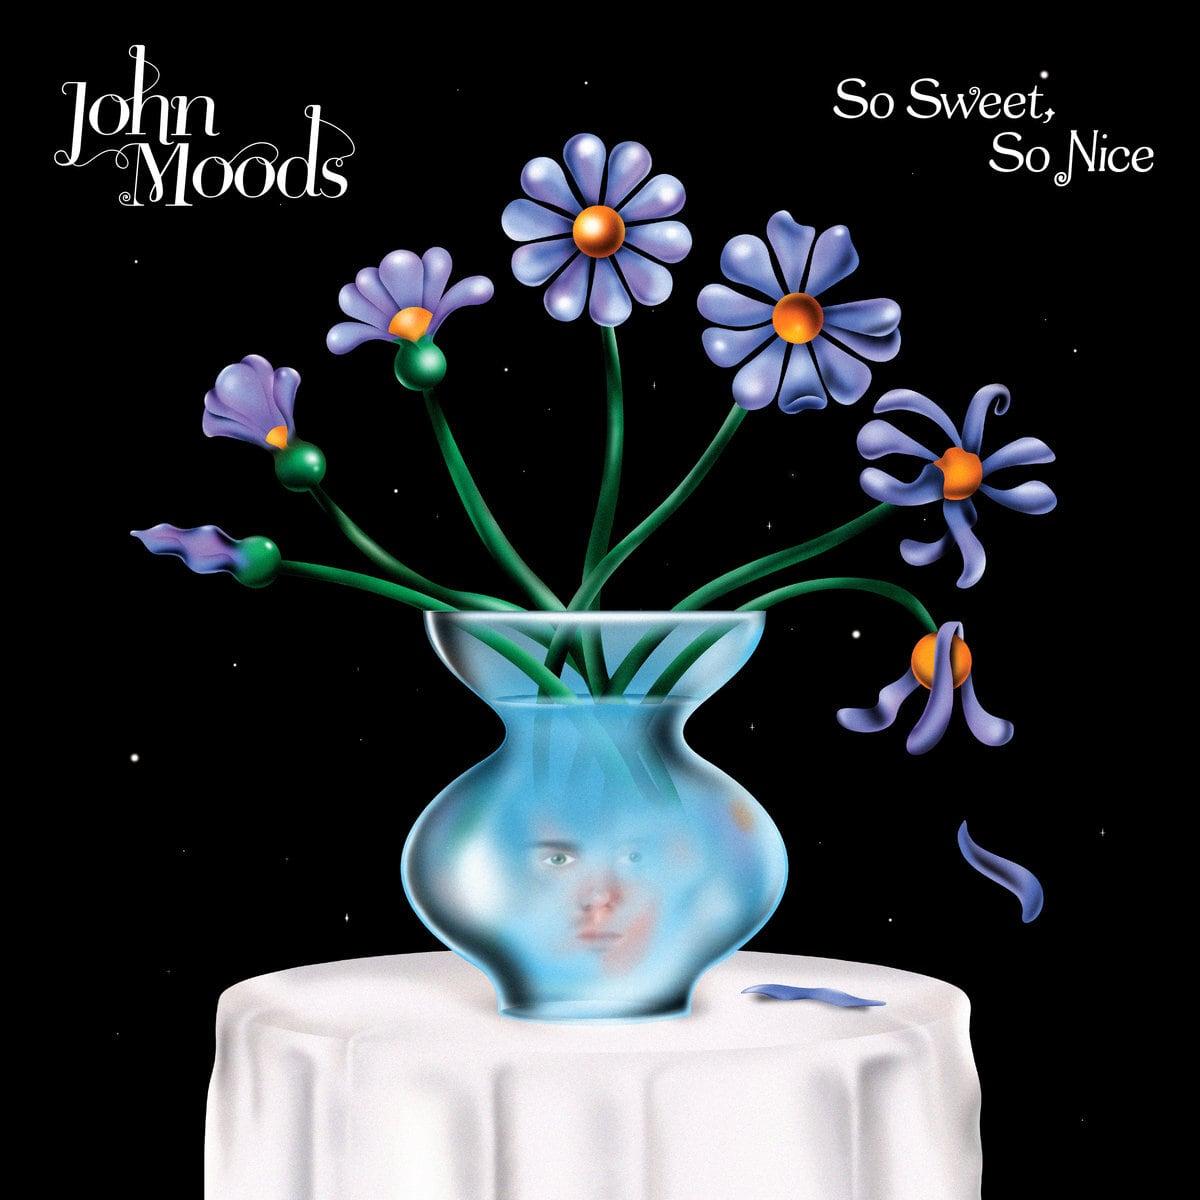 John Moods - So Sweet So Nice (LP)